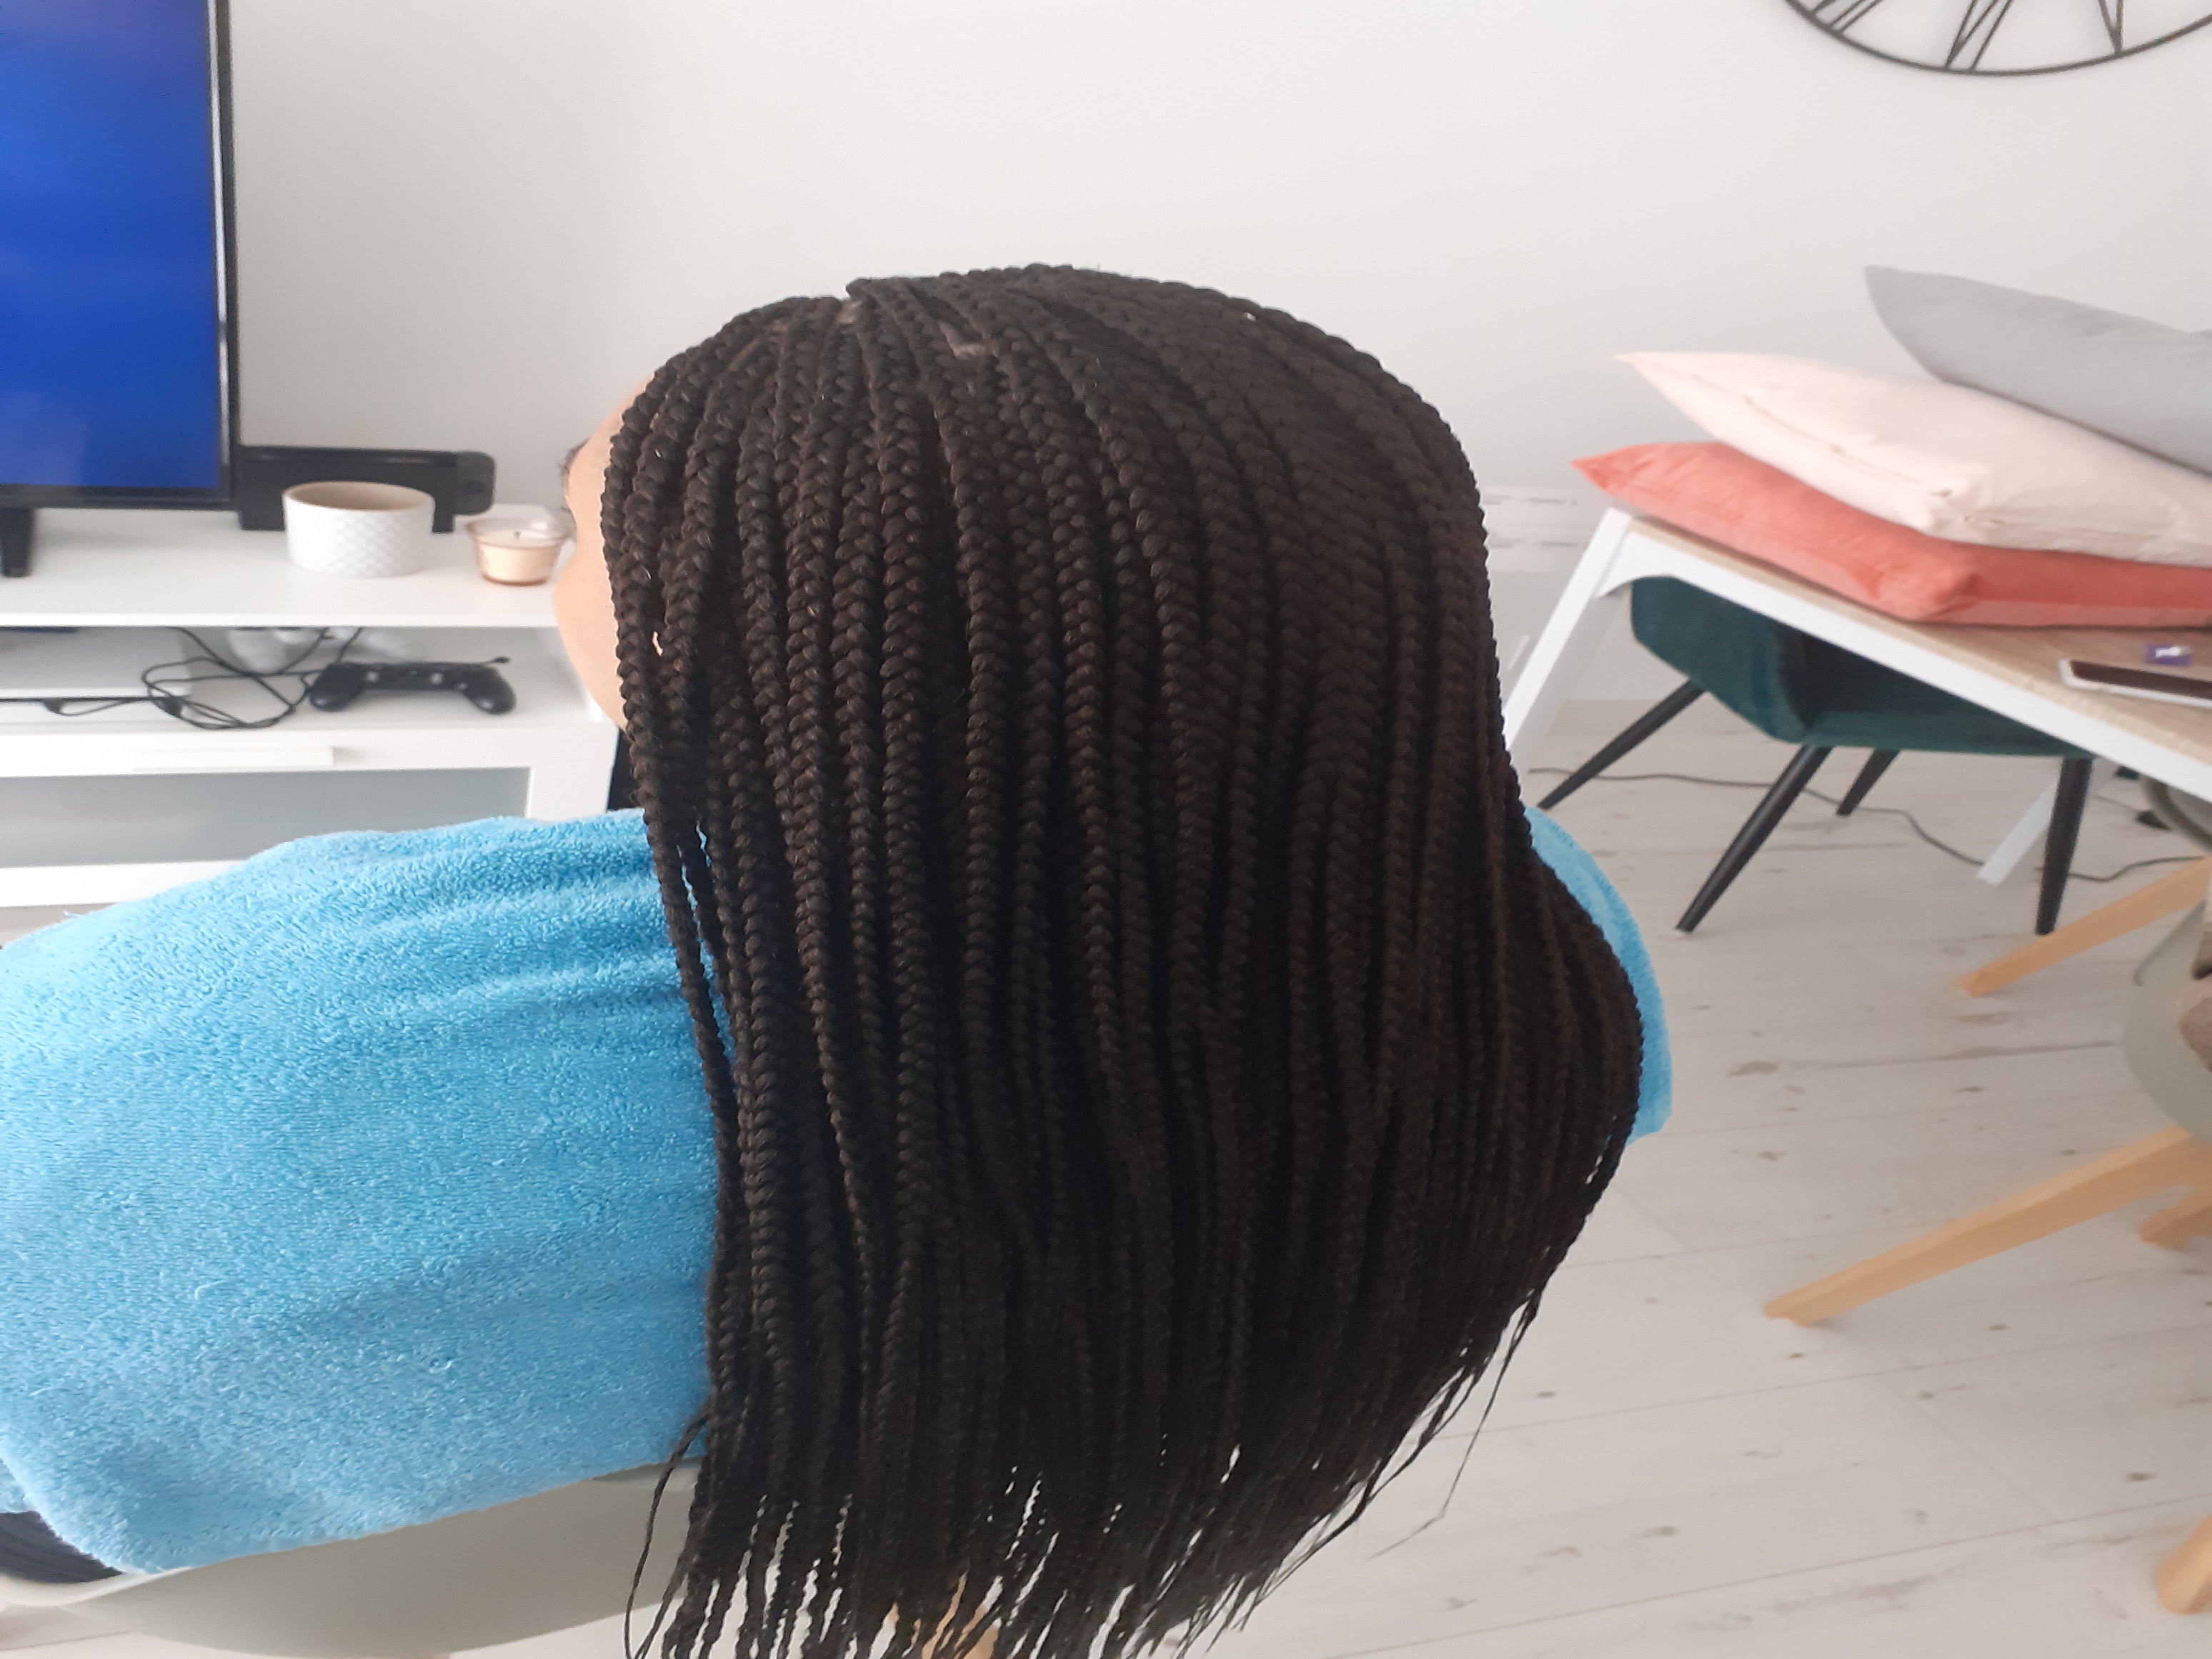 salon de coiffure afro tresse tresses box braids crochet braids vanilles tissages paris 75 77 78 91 92 93 94 95 UZIKPRNN